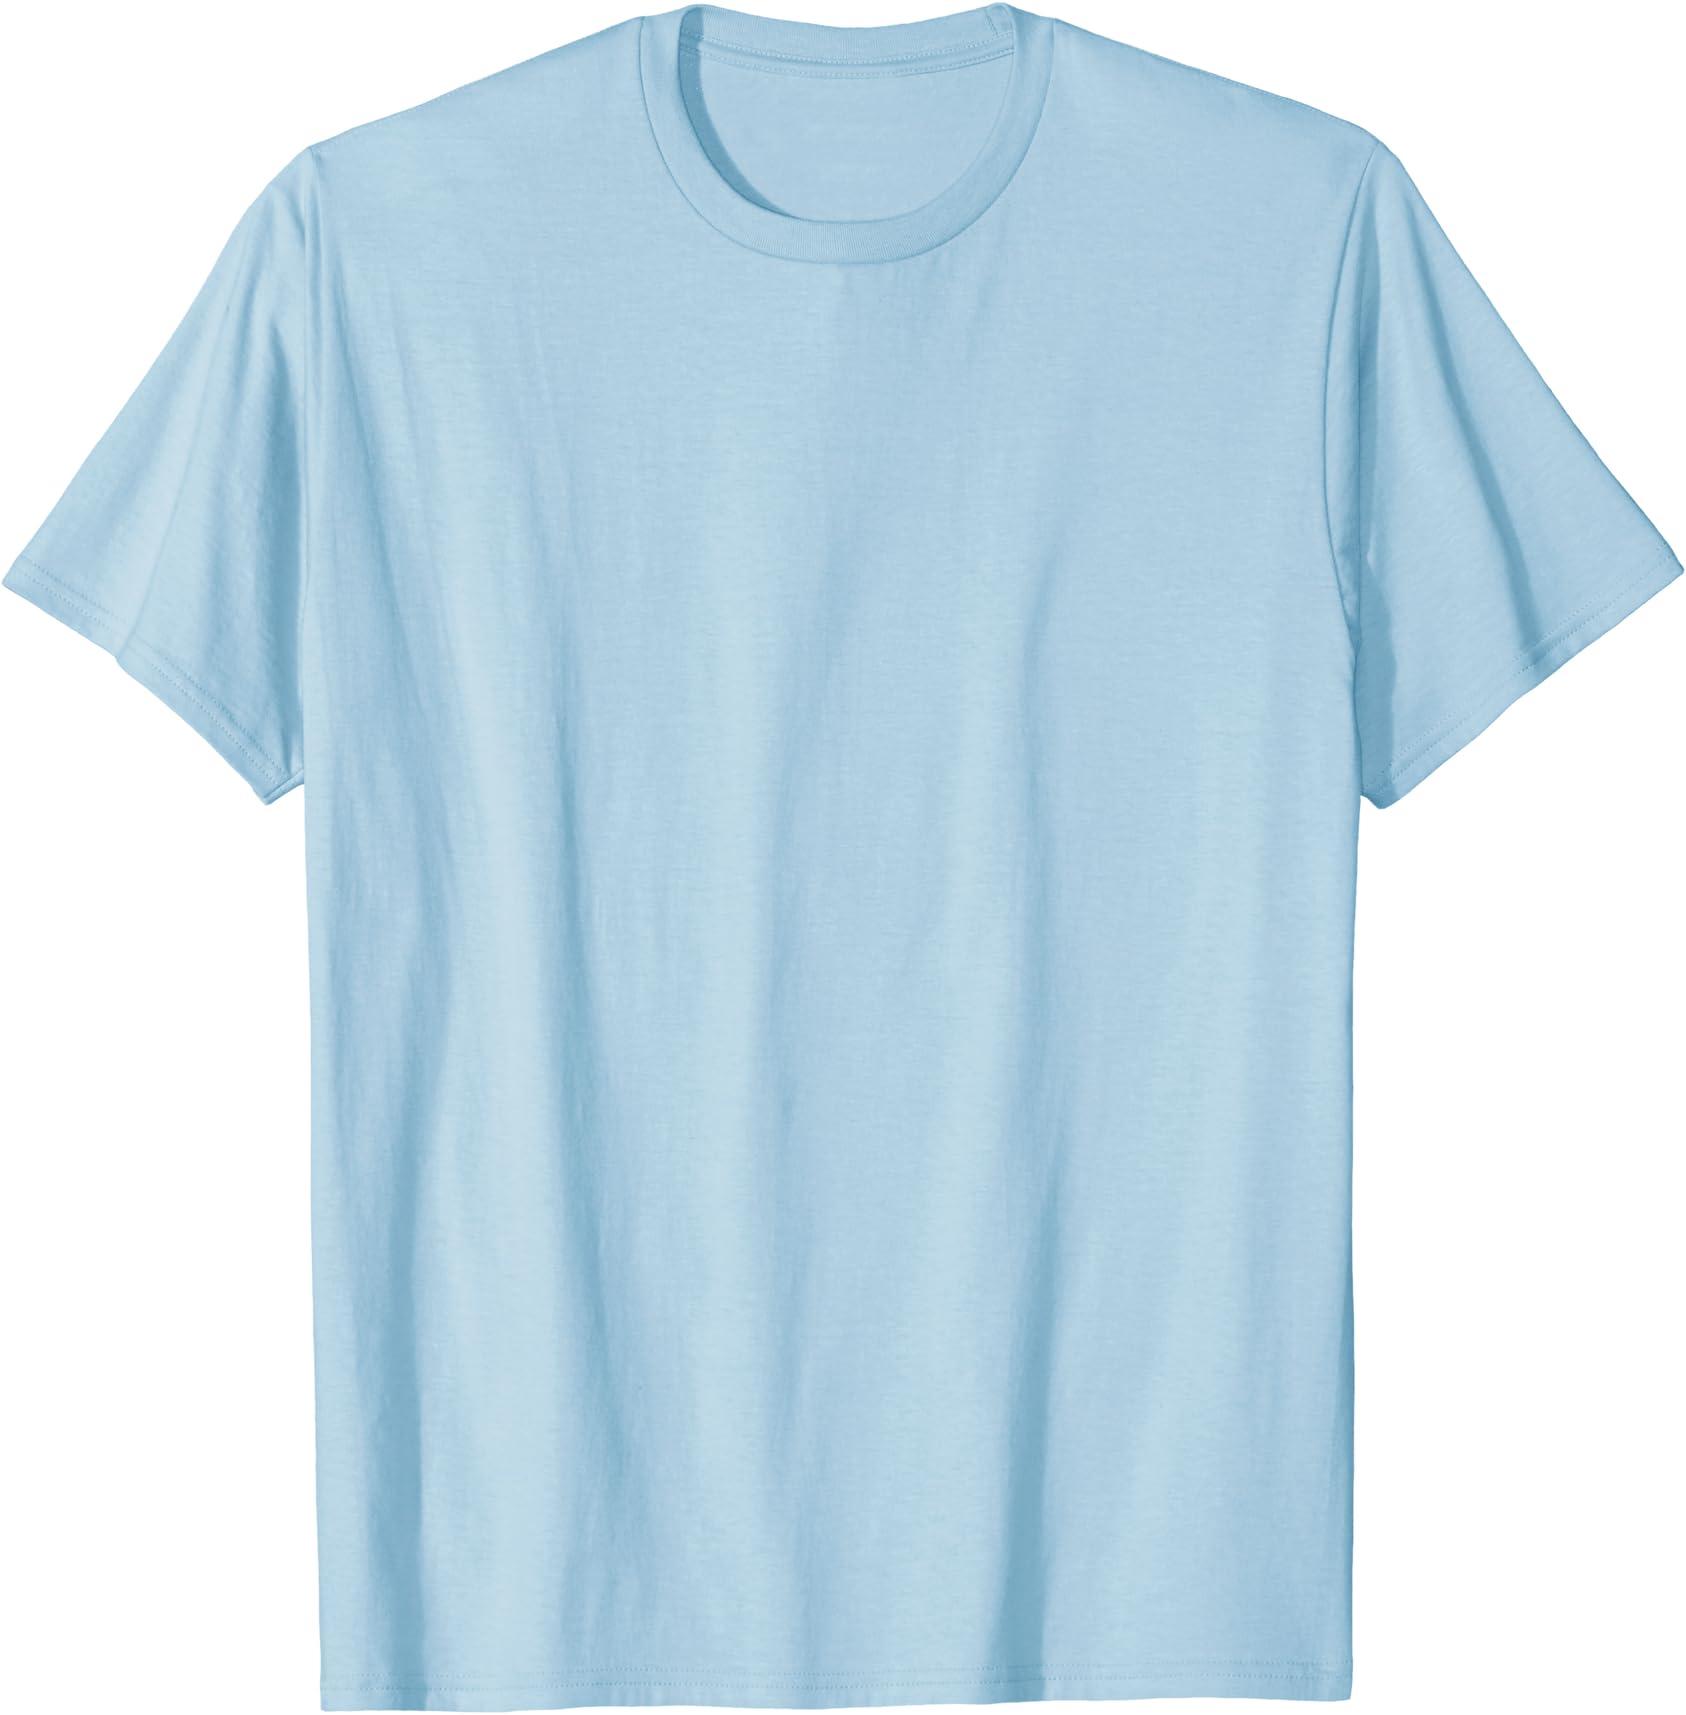 Creating My Happiness Short-Sleeve Unisex T-Shirt